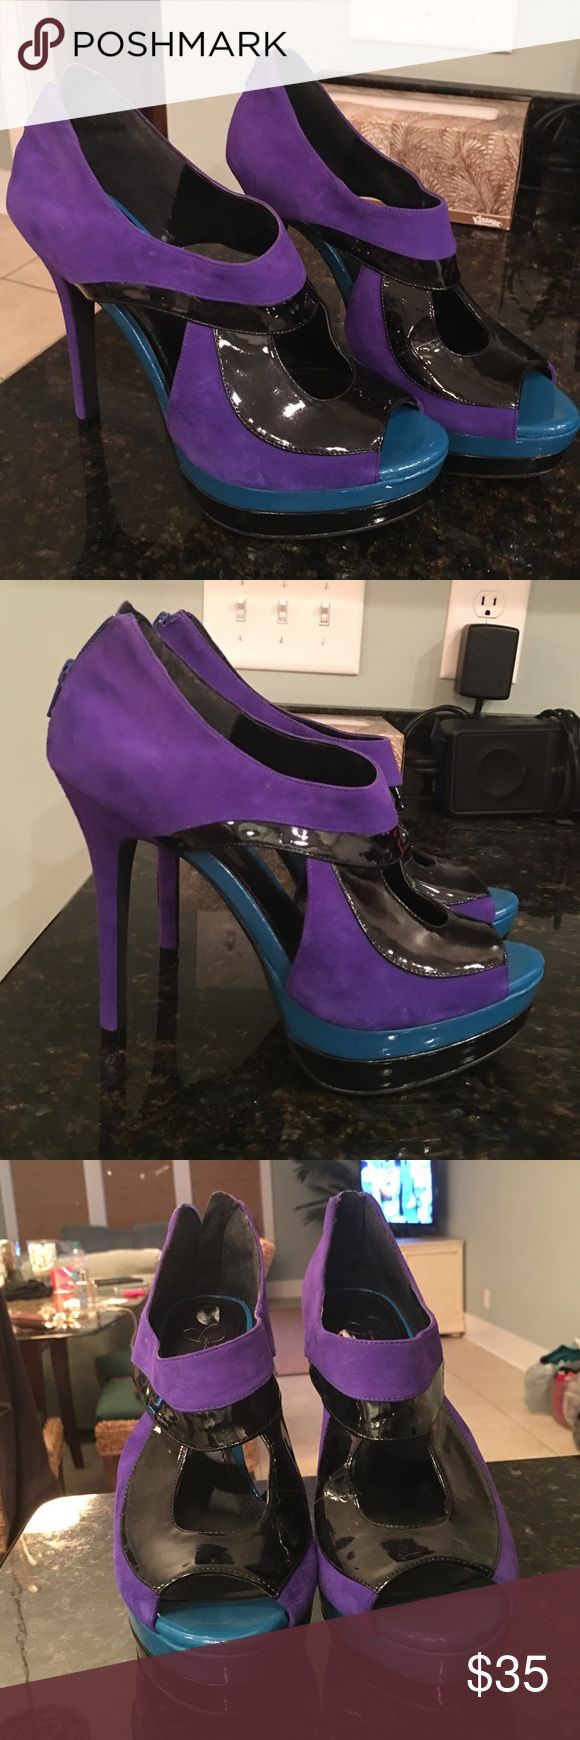 Jessica Simpson Heels Size 9 Size 9 Jessica Simpson heels purple, blue and black. Never been worn. Jessica Simpson Shoes Heels